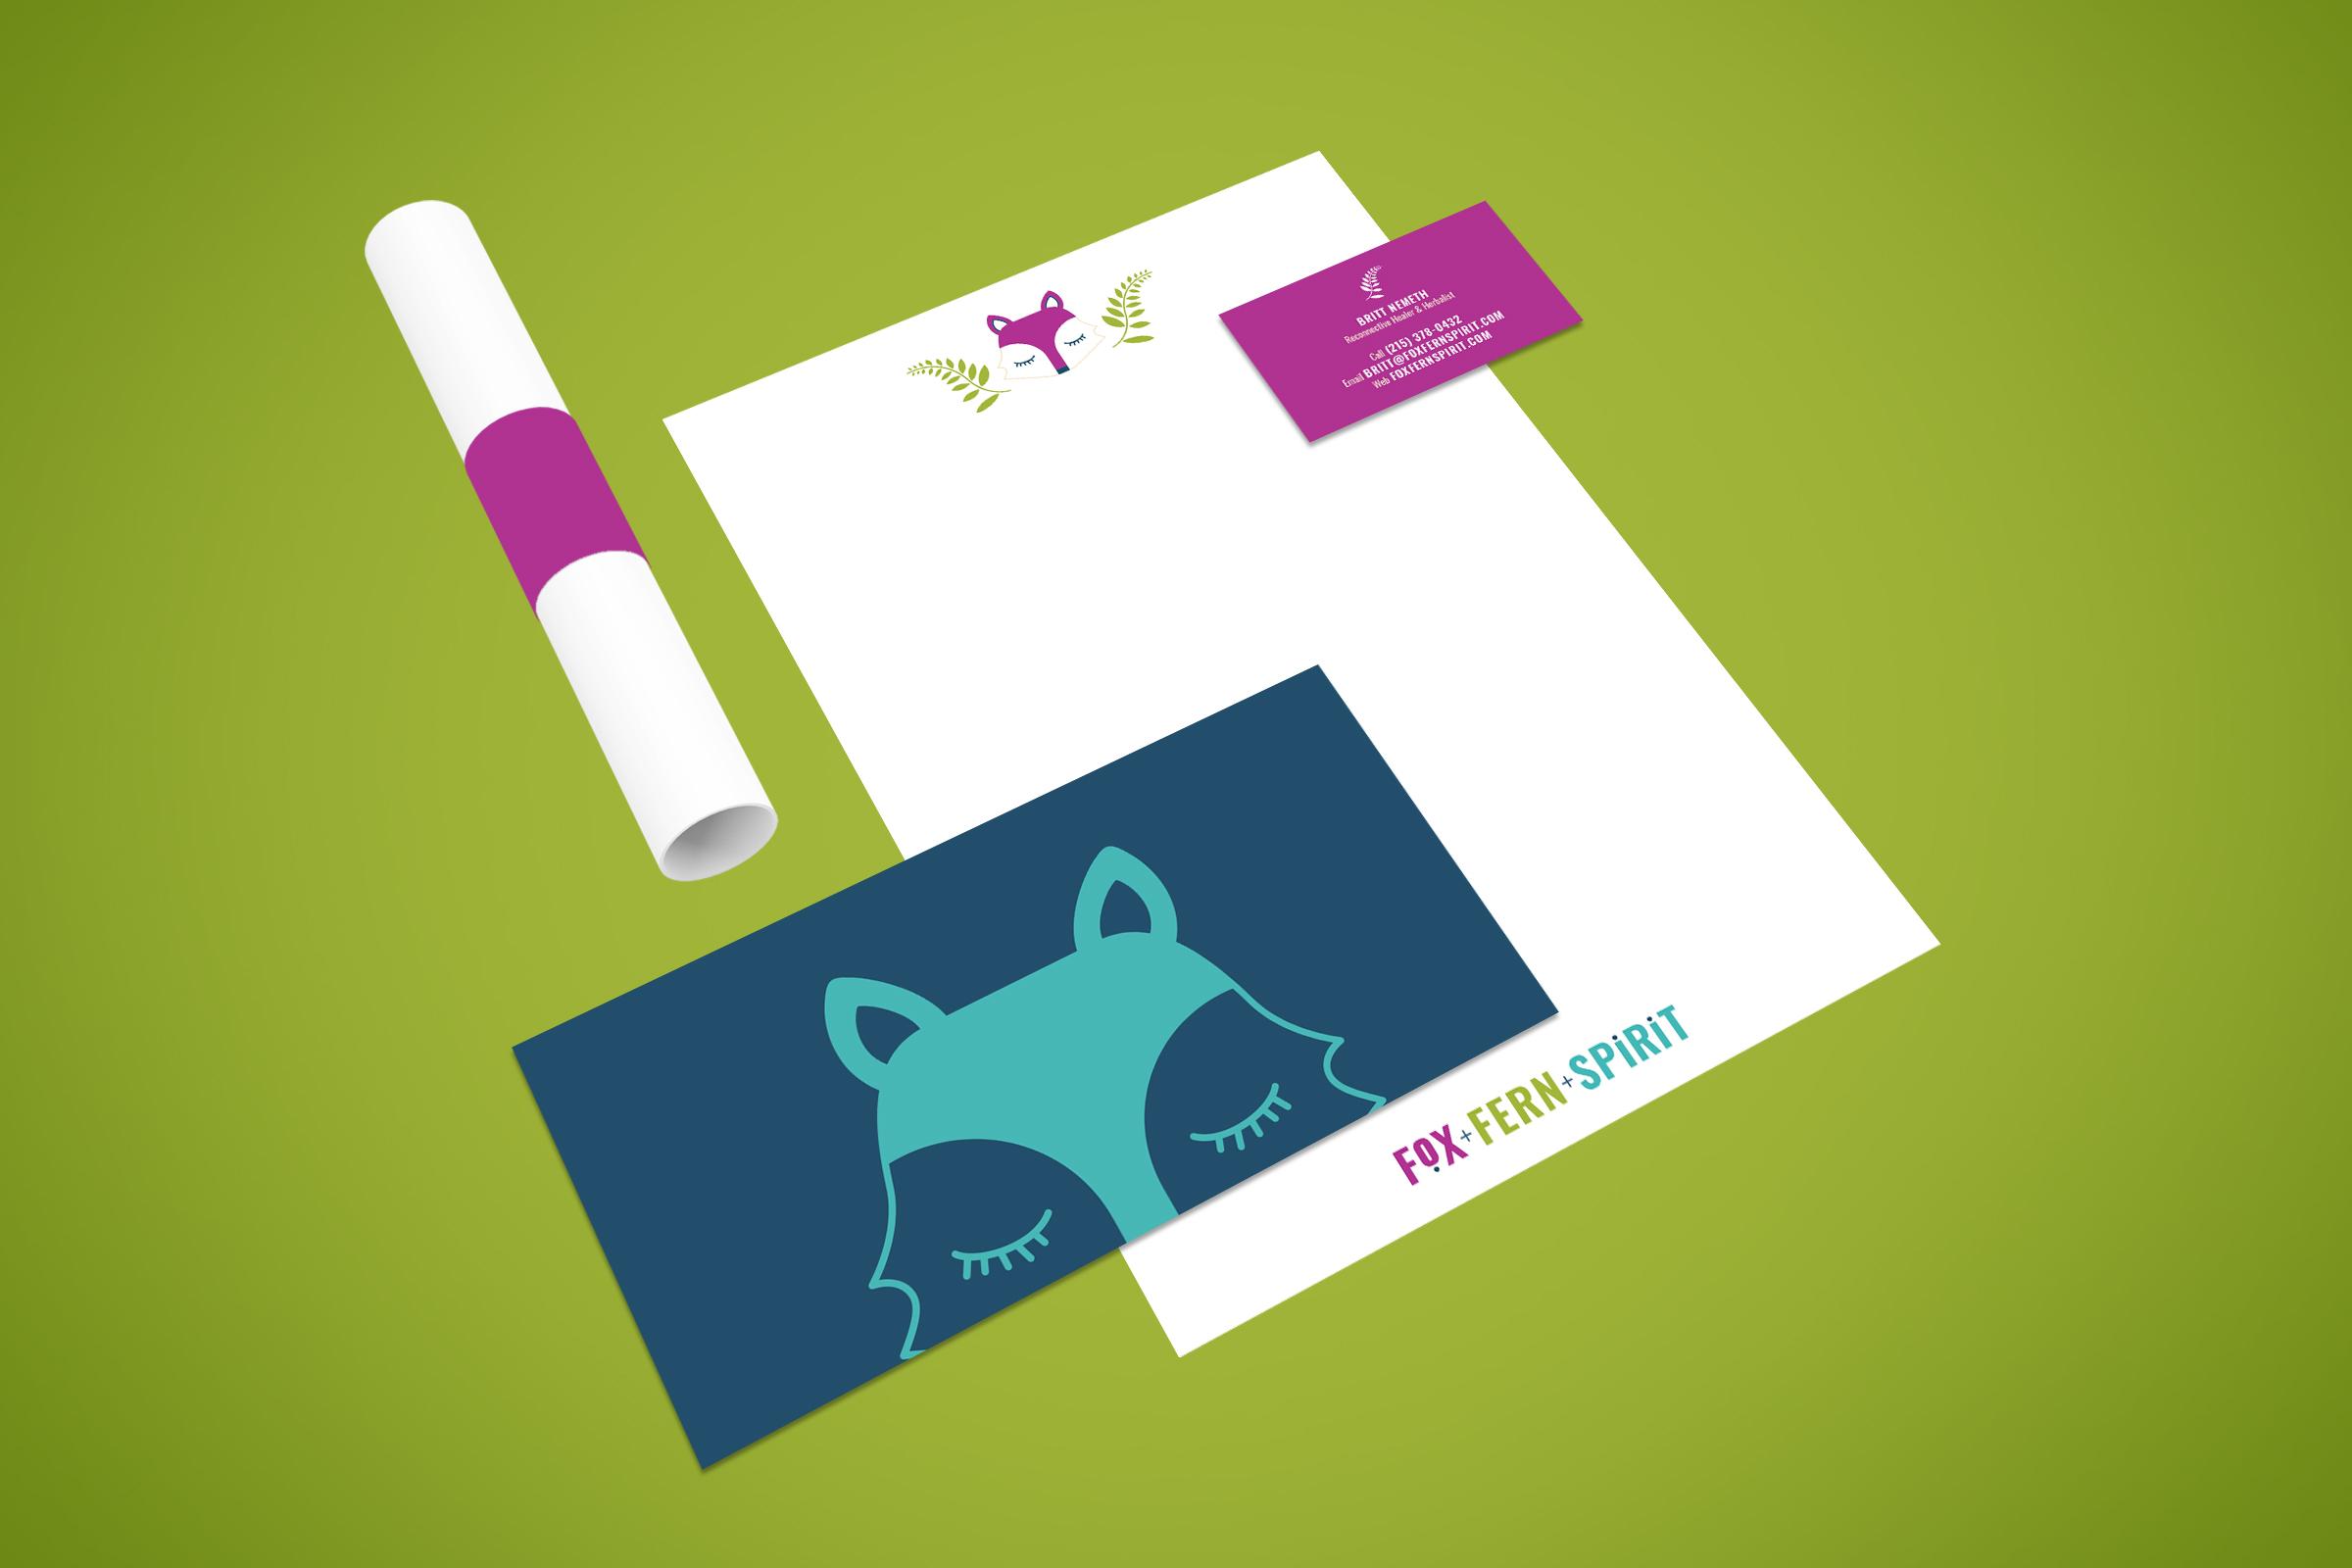 hearthfire-creative-logo-brand-identity-designer-denver-colorado-fox-fern-spirit-2.jpg